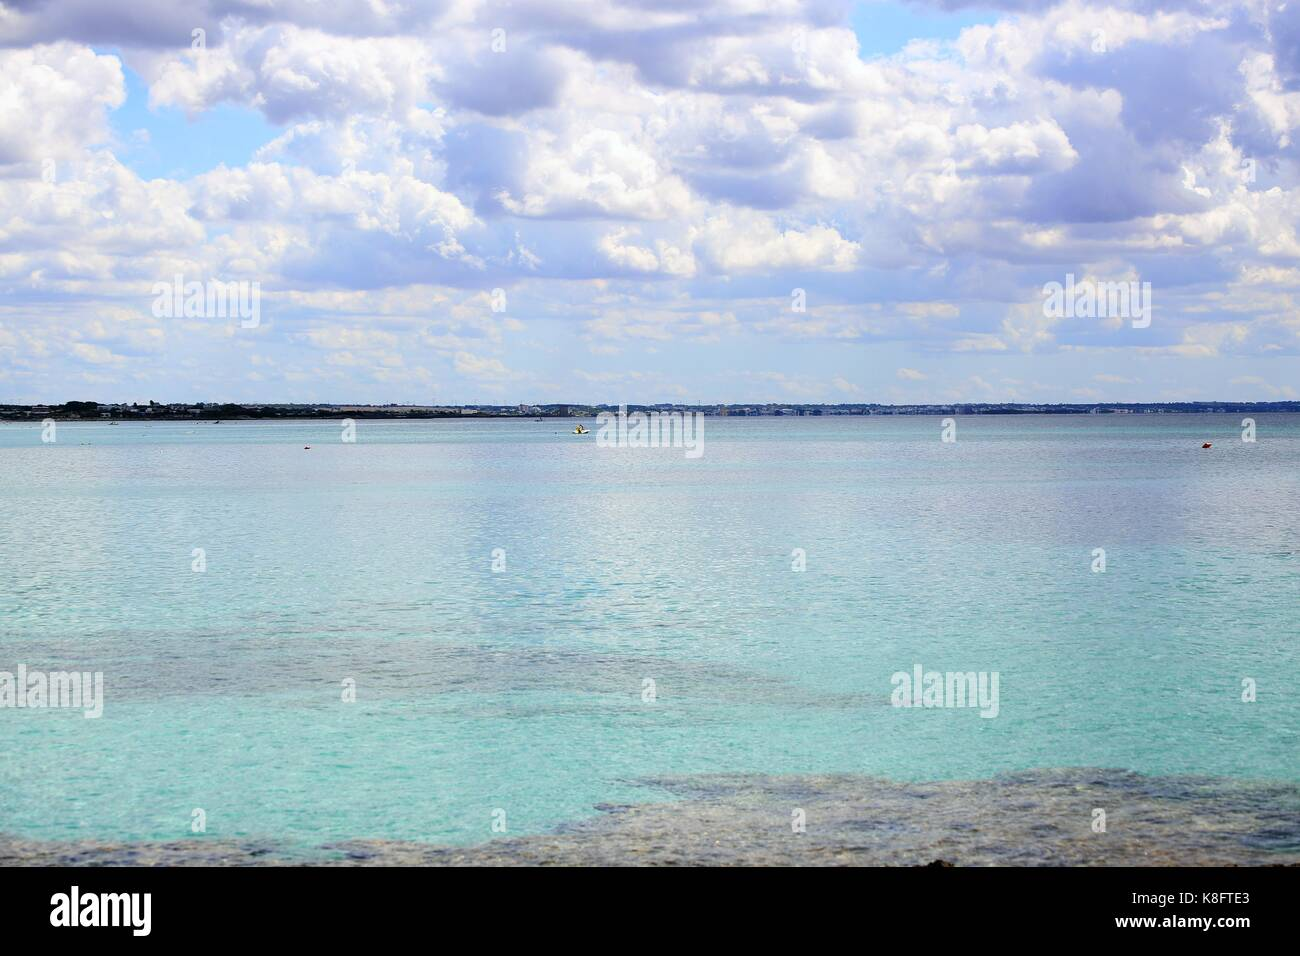 Sea view - Stock Image